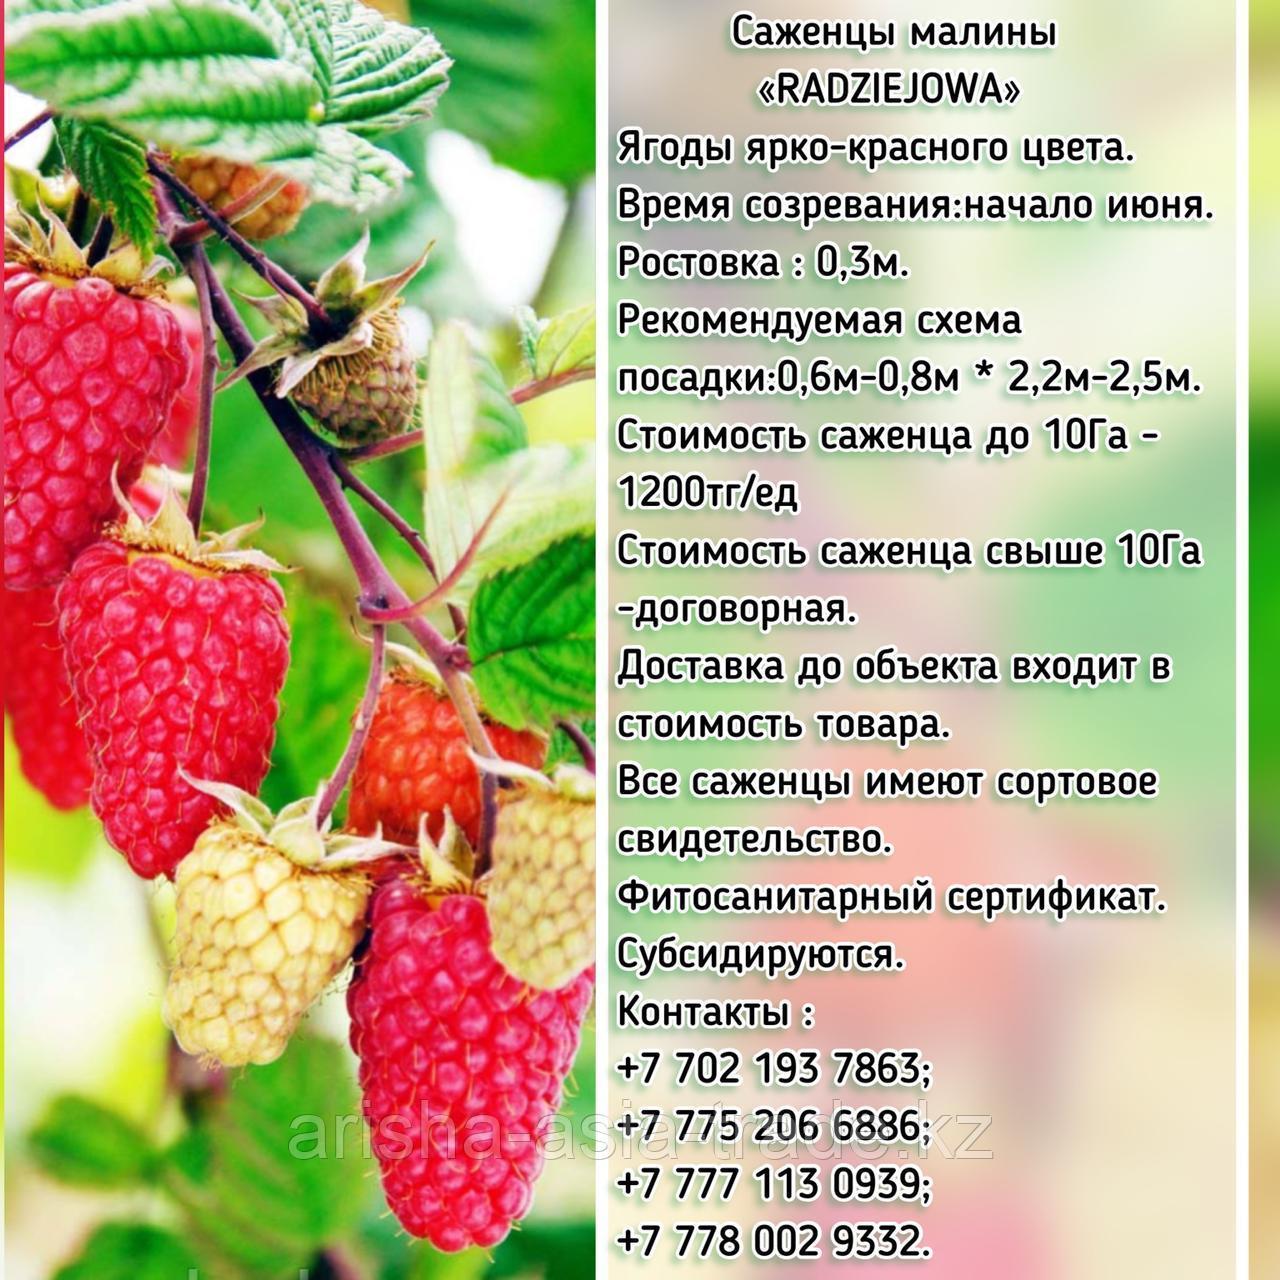 "Саженцы малины ""Radziejowa"" (Радзейова) Сербия"